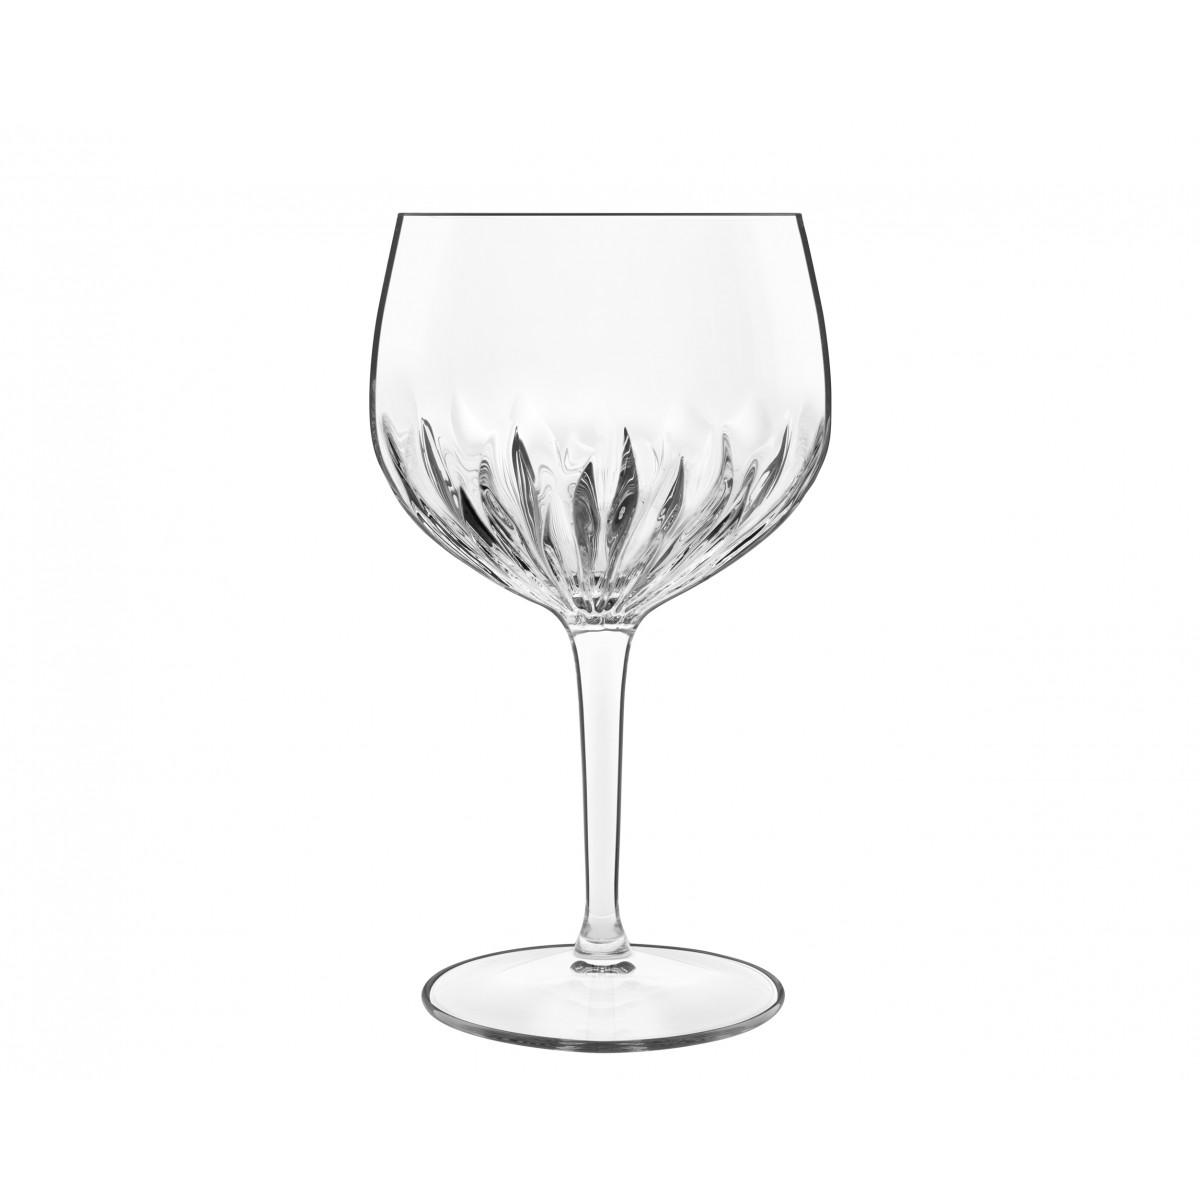 LUIGI BORMIOLI Mixology spansk gin & tonic-glas 4 stk klar - 80 cl